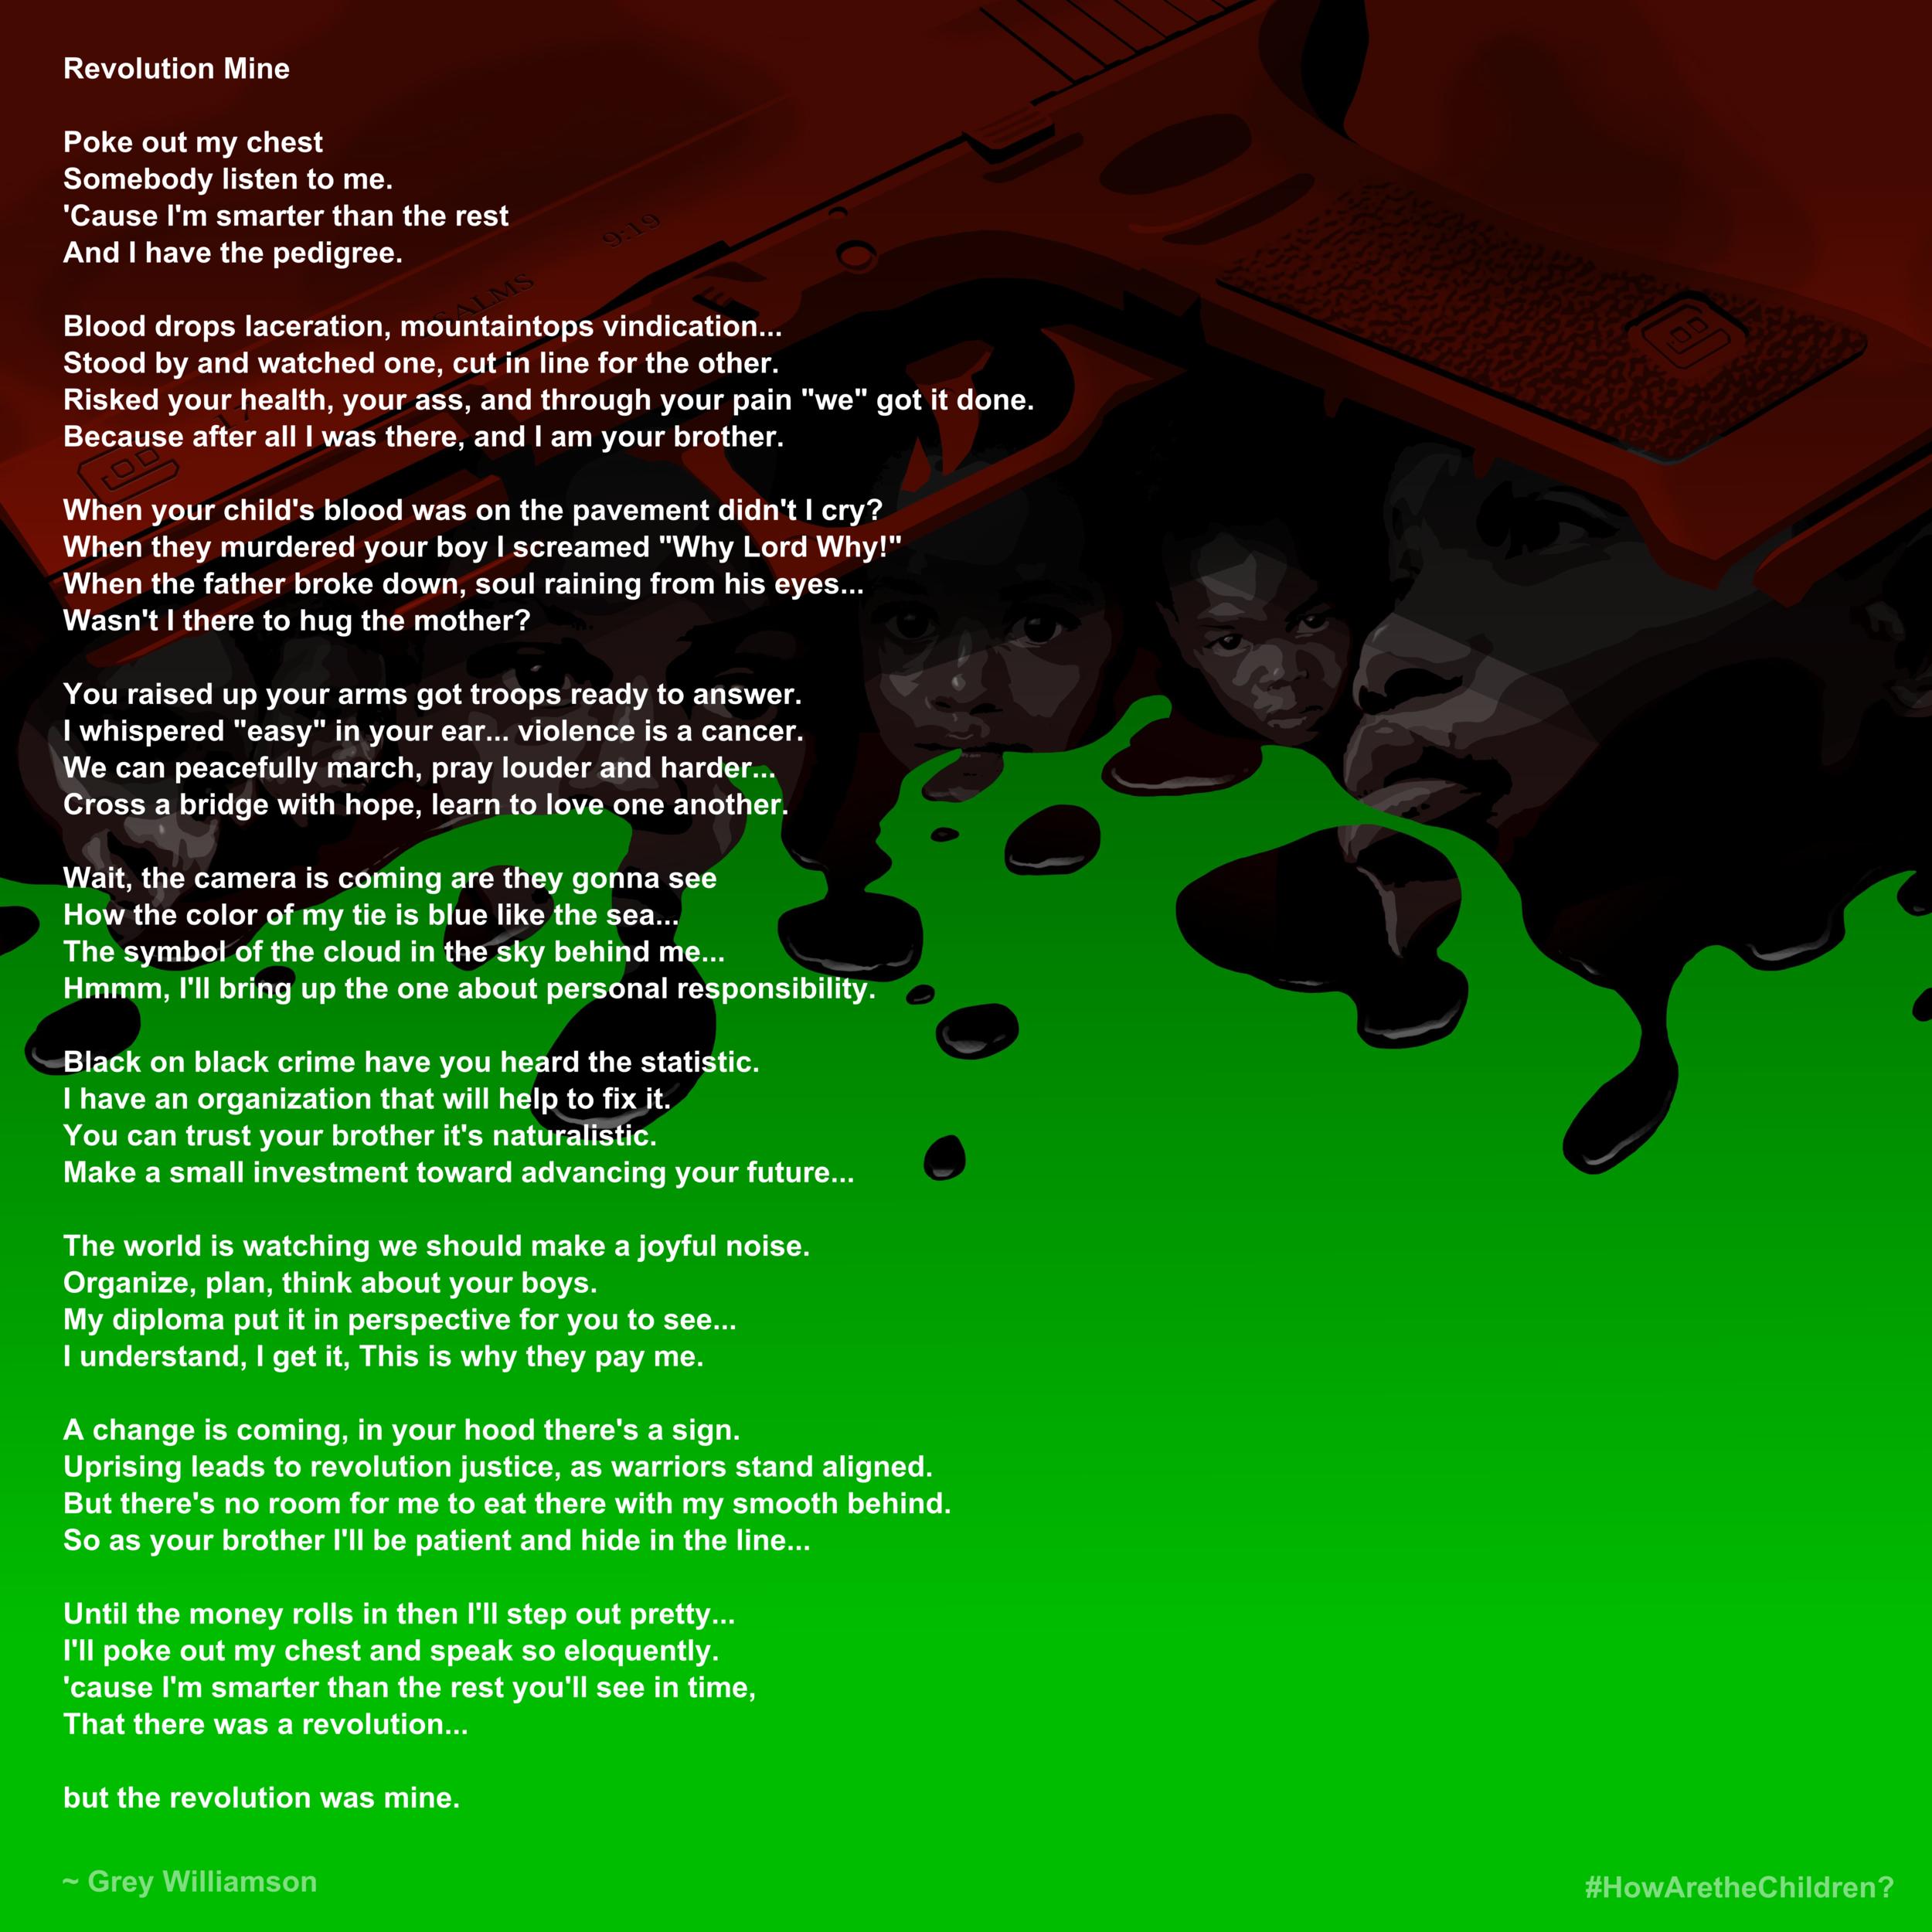 arise_grey_williamson_revolution_rhyme_reason.png